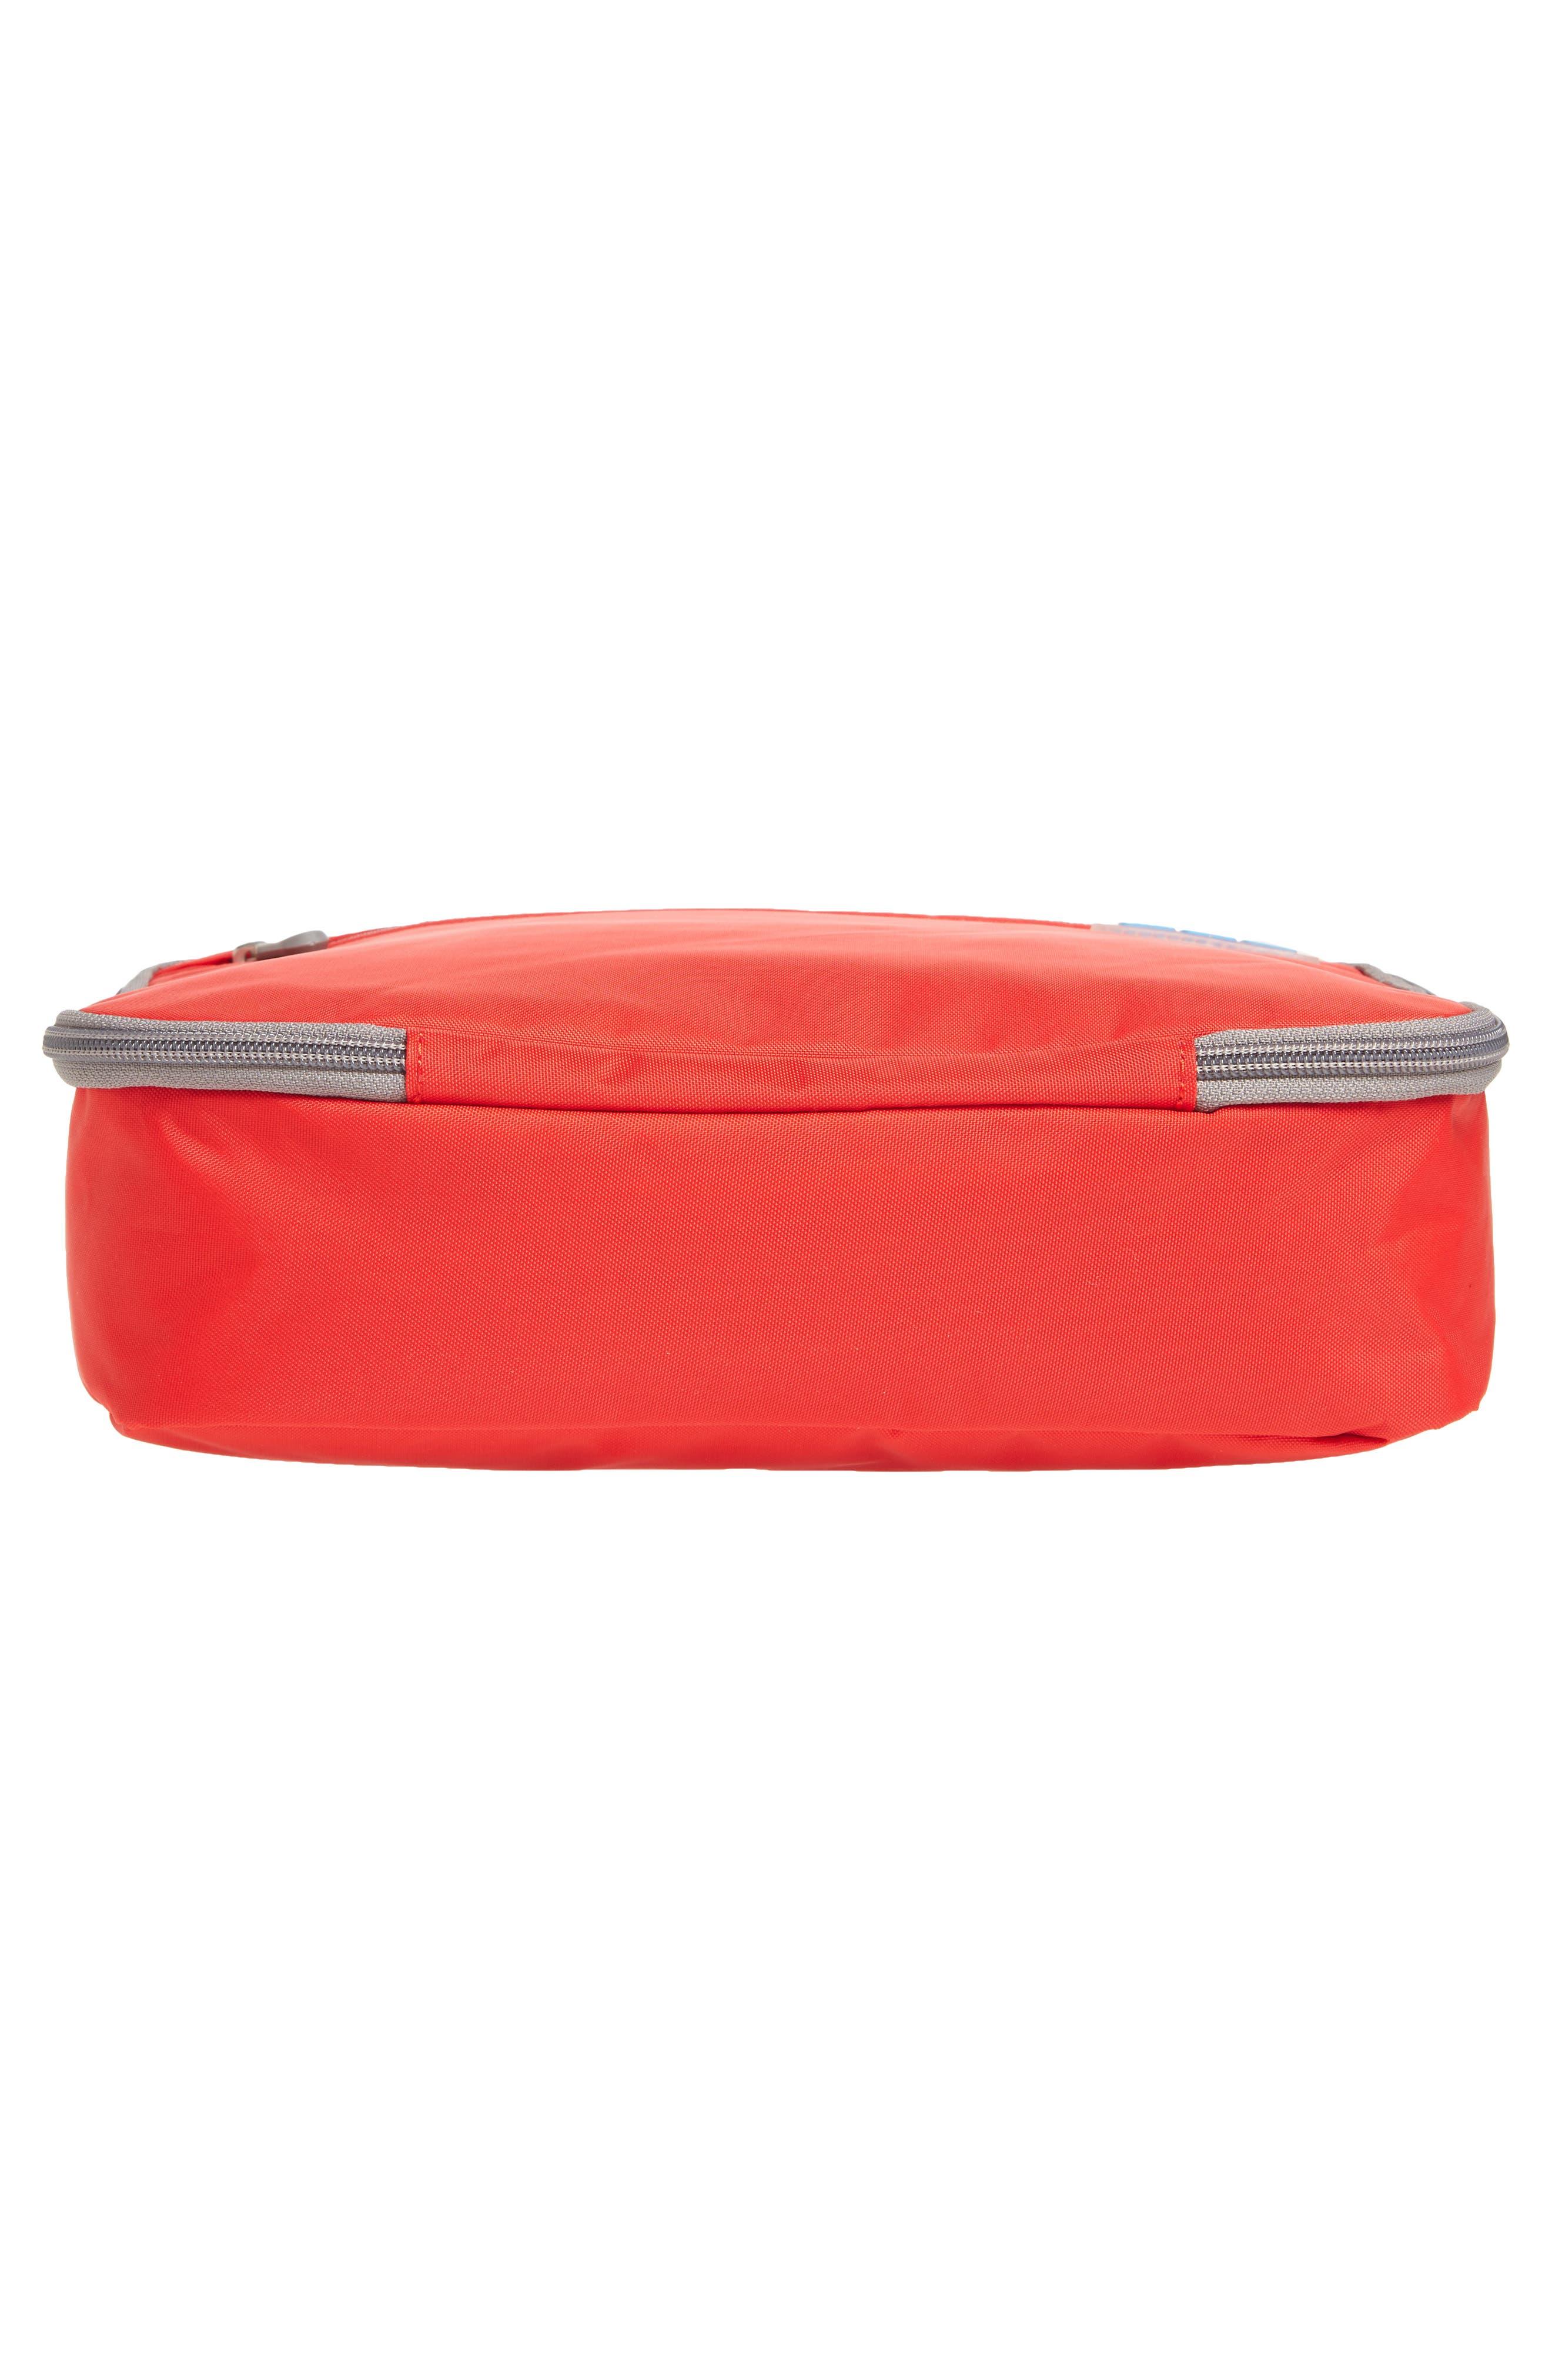 Seat Pak Pro Plane Seat Organizer,                             Alternate thumbnail 5, color,                             Red